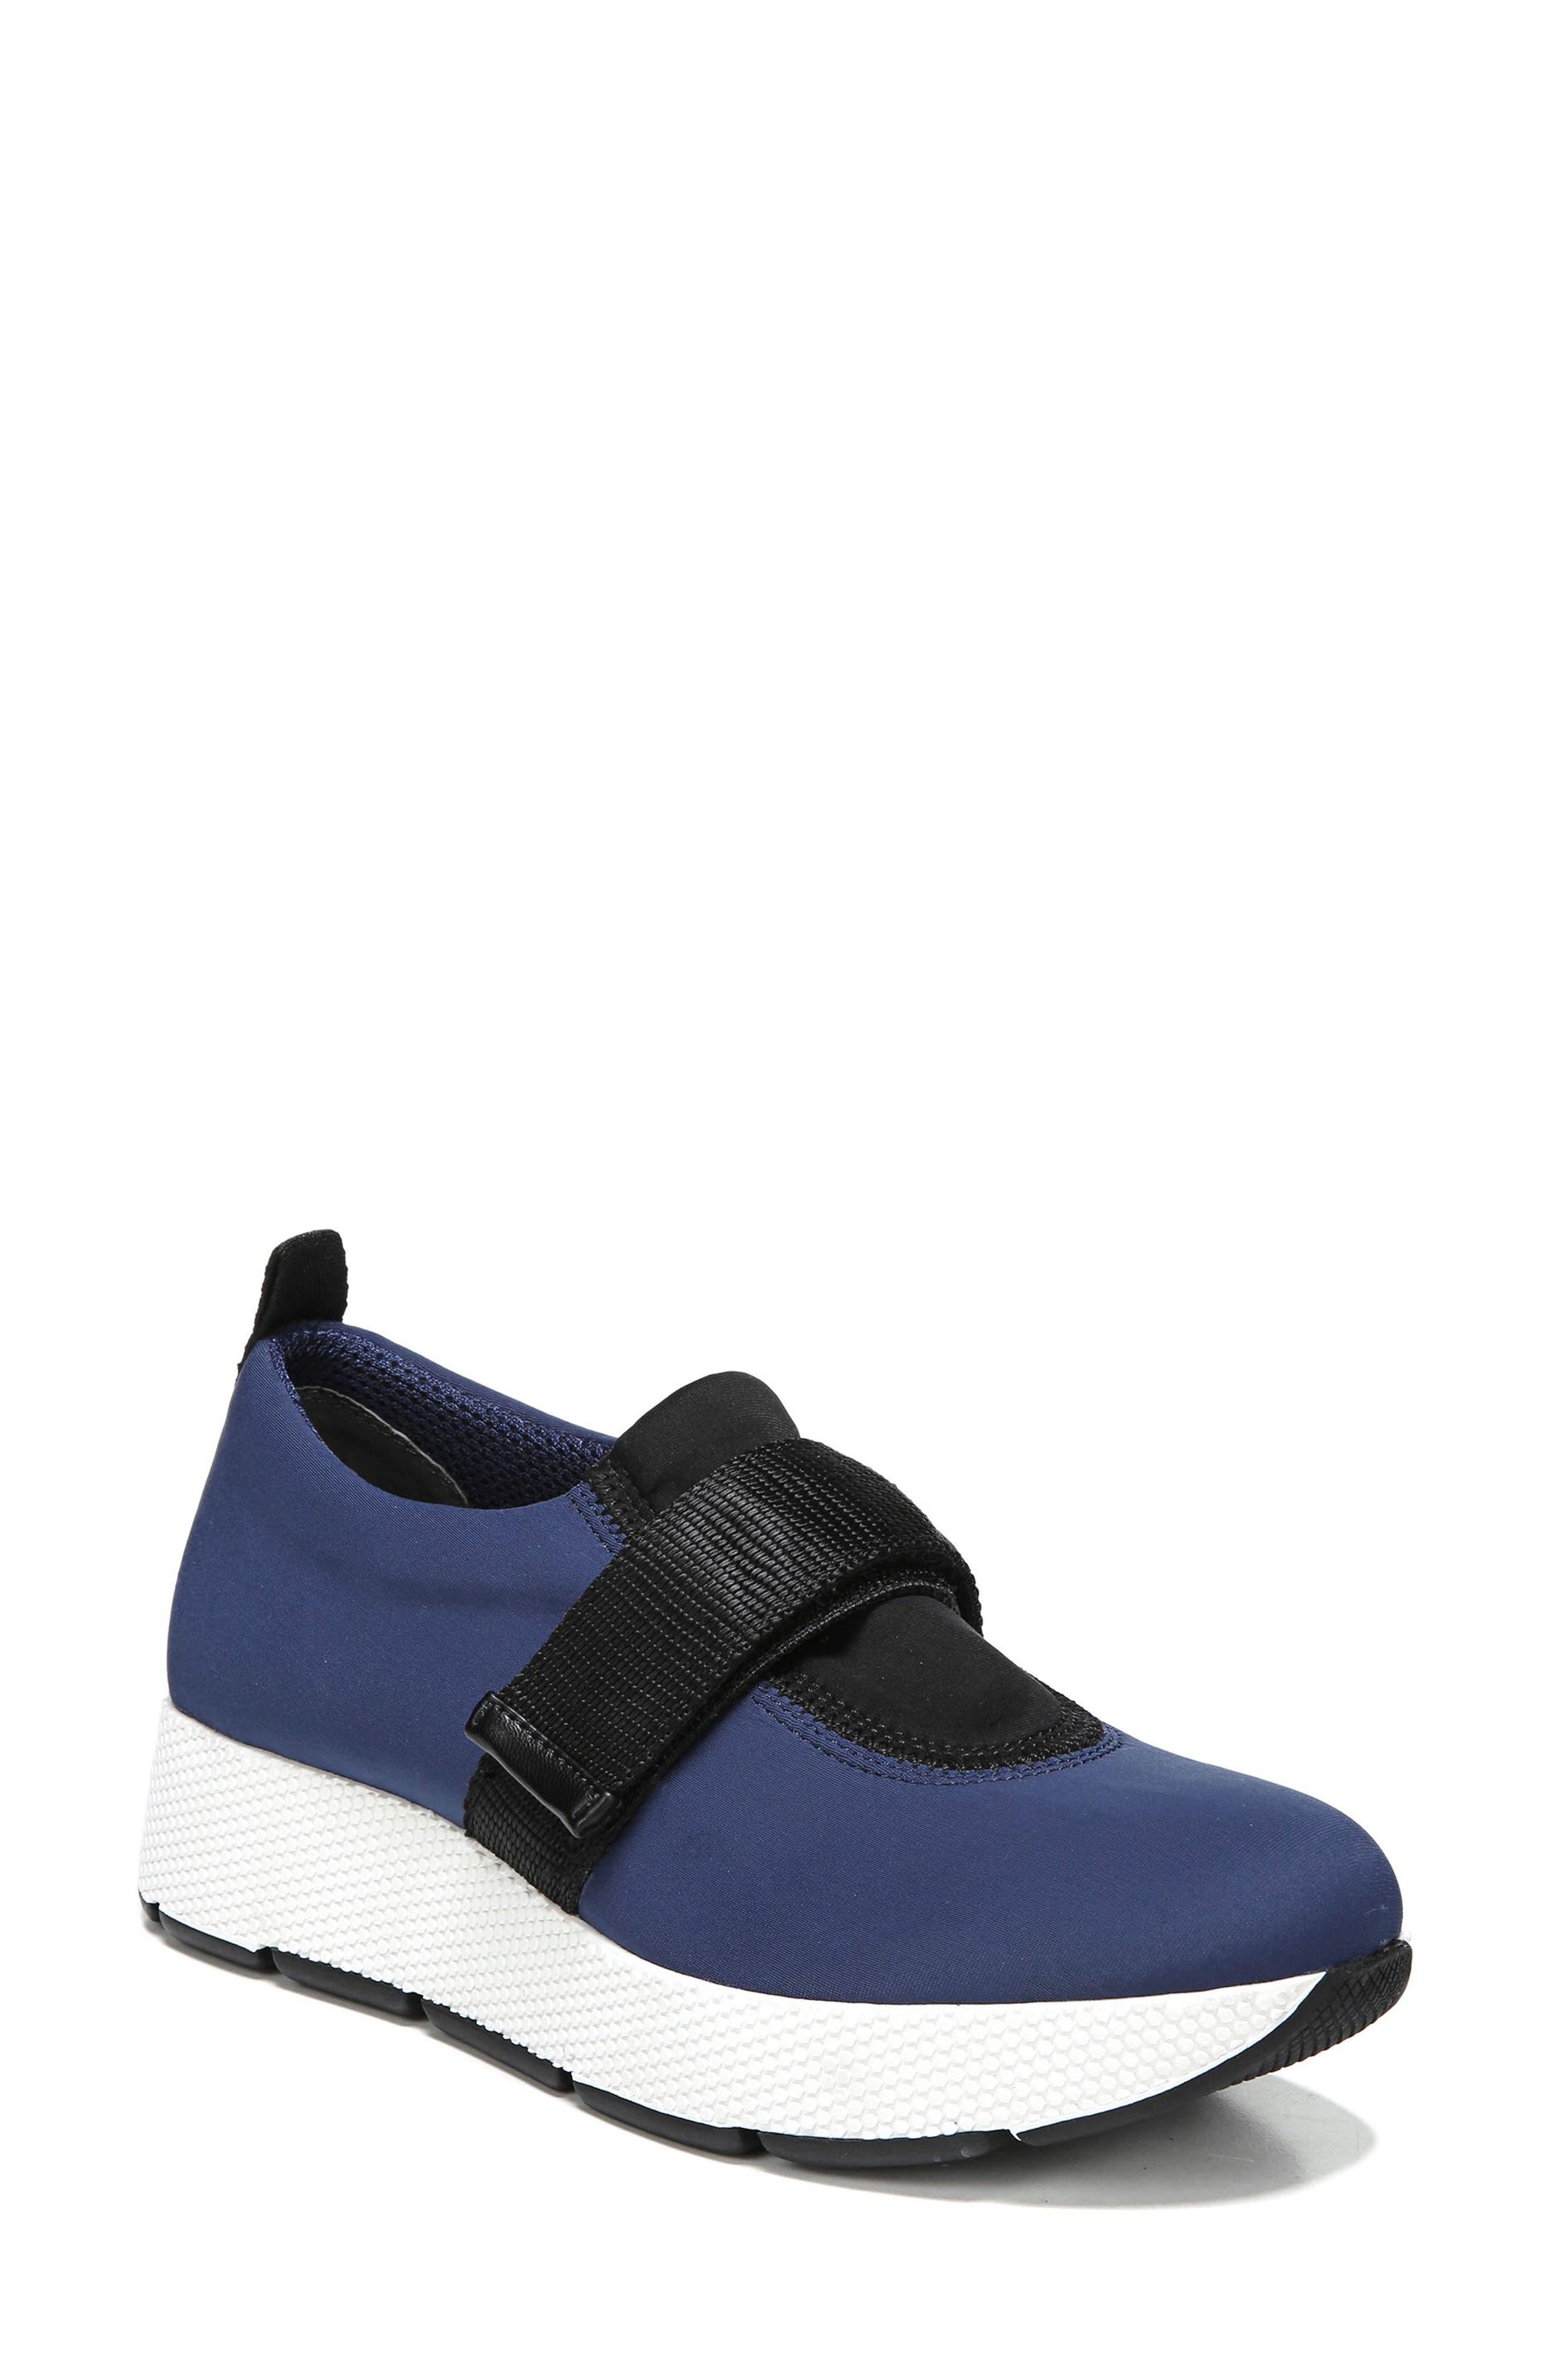 Odella Slip-On Sneaker,                         Main,                         color, Navy Fabric